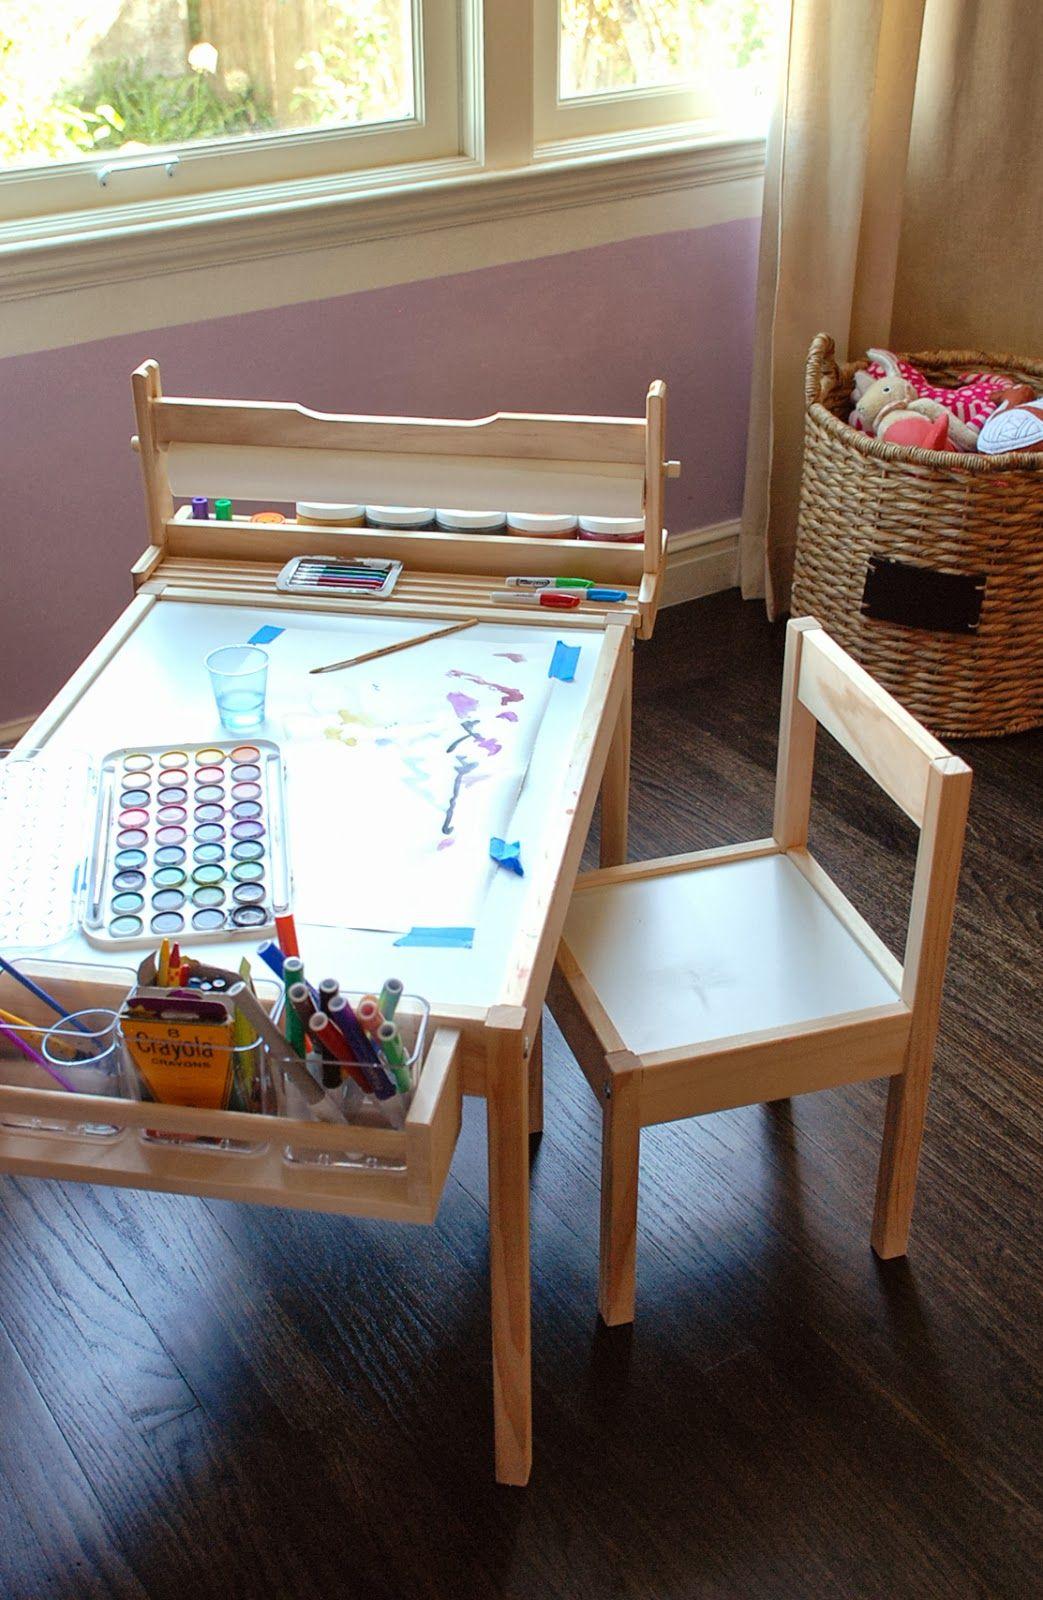 Design Ingenuity Diy Kids Craft Table In 2019 Craft